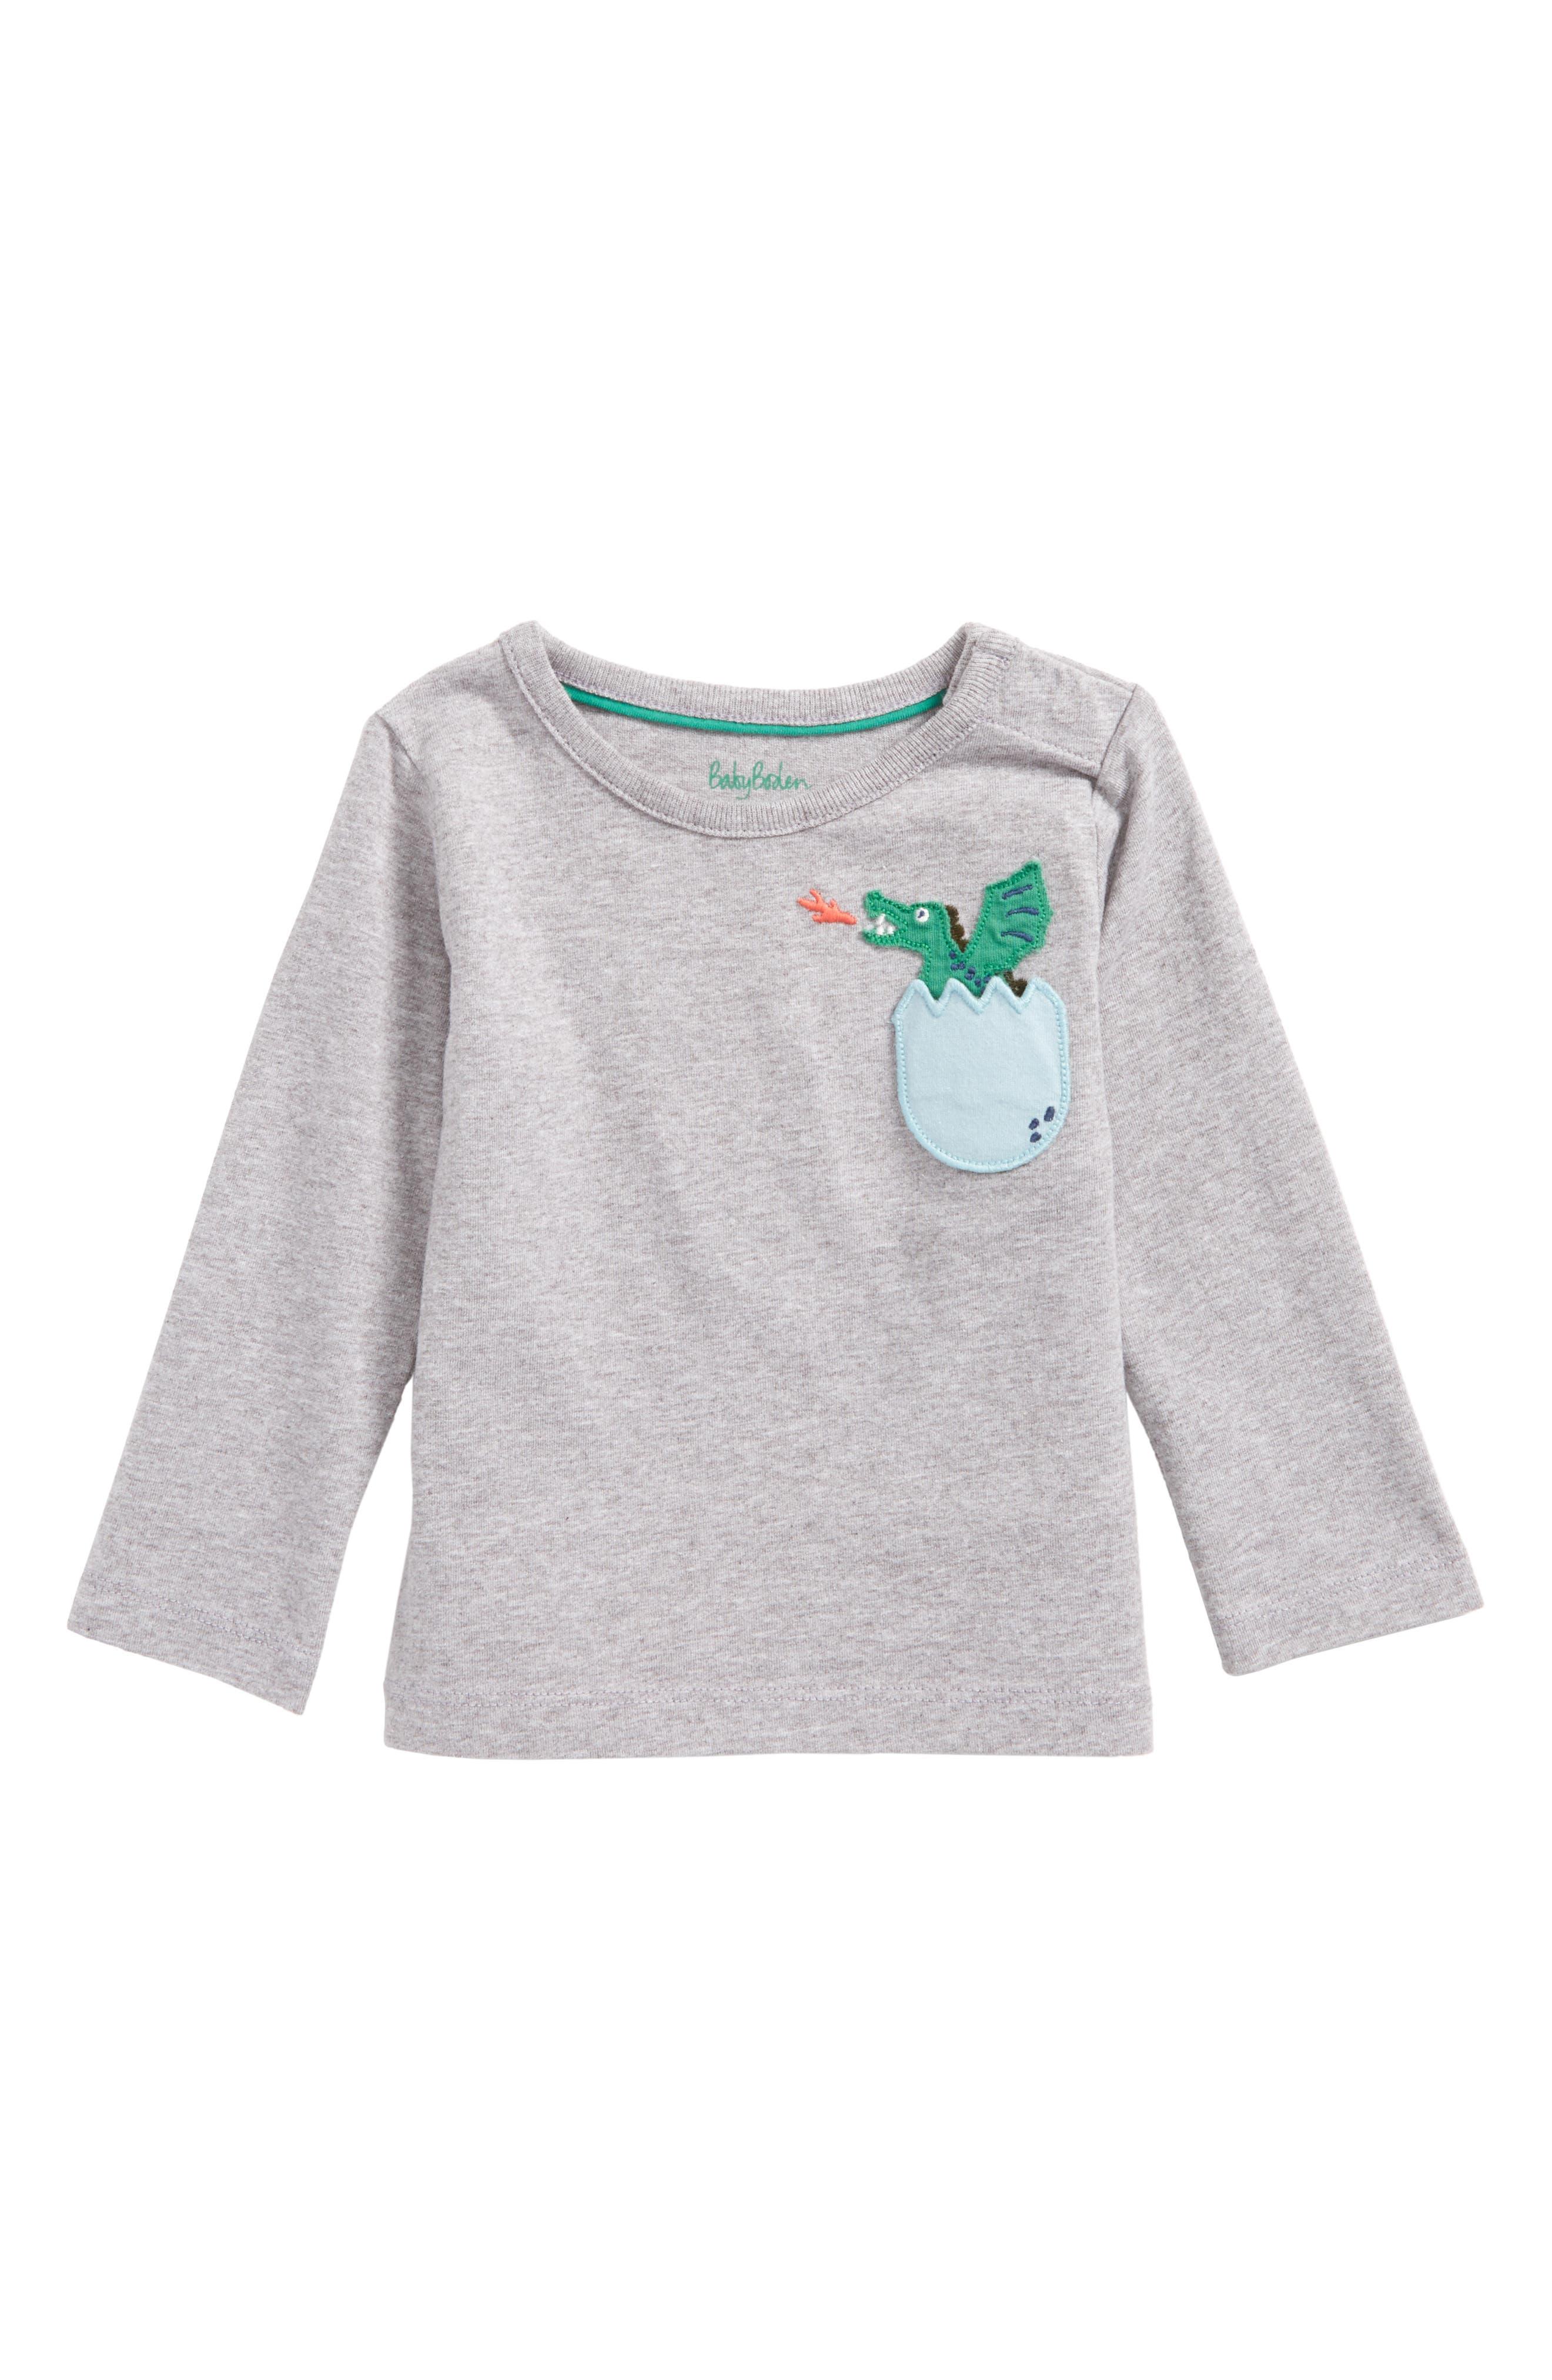 Alternate Image 1 Selected - Mini Boden Adventure Pocket T-Shirt (Baby Boys & Toddler Boys)